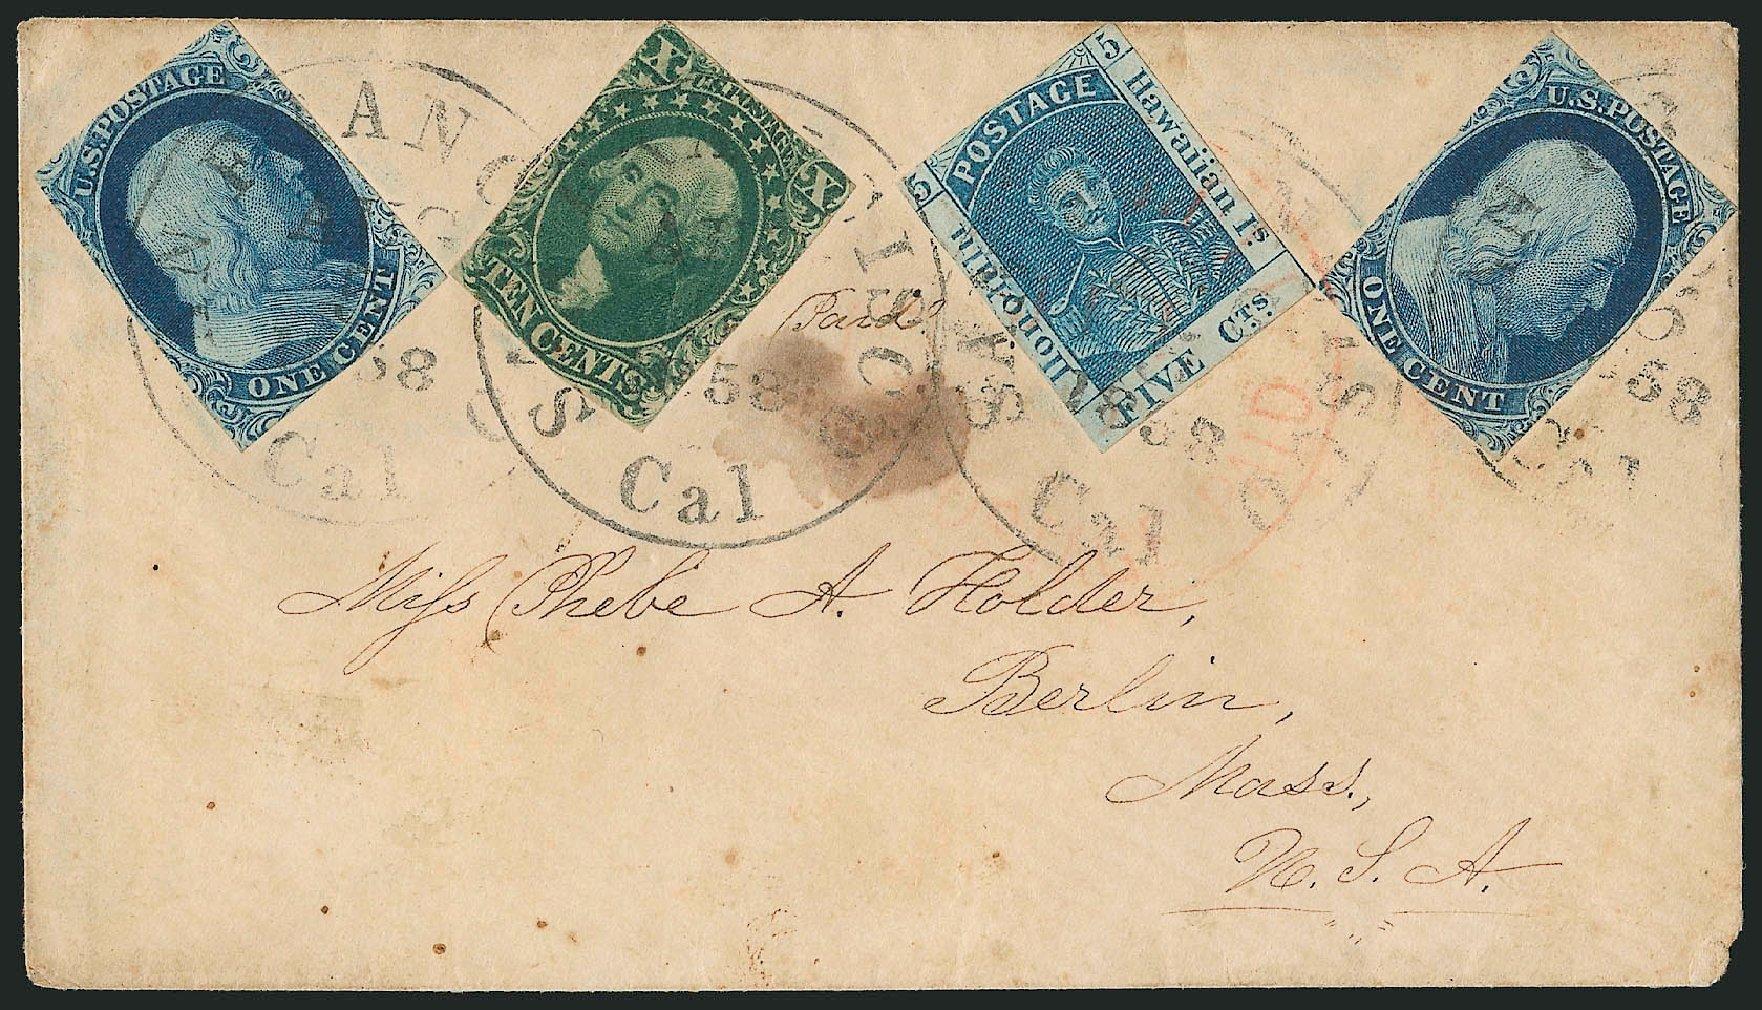 Value of US Stamp Scott Catalog # 8 - 1857 1c Franklin. Robert Siegel Auction Galleries, Jun 2015, Sale 1105, Lot 2536